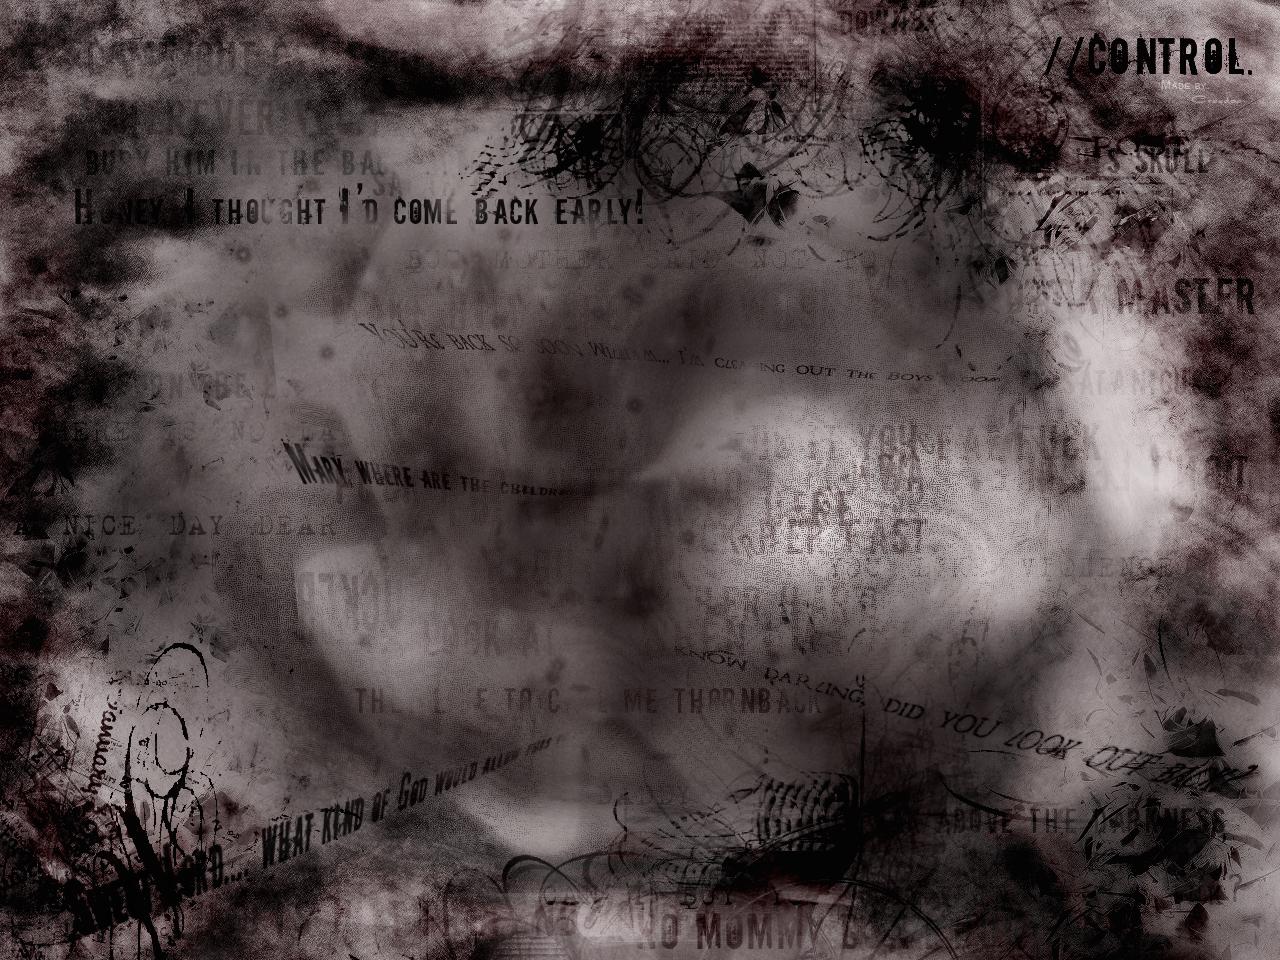 Gothic Computer Wallpapers Desktop Backgrounds 1280x960 ID179346 1280x960